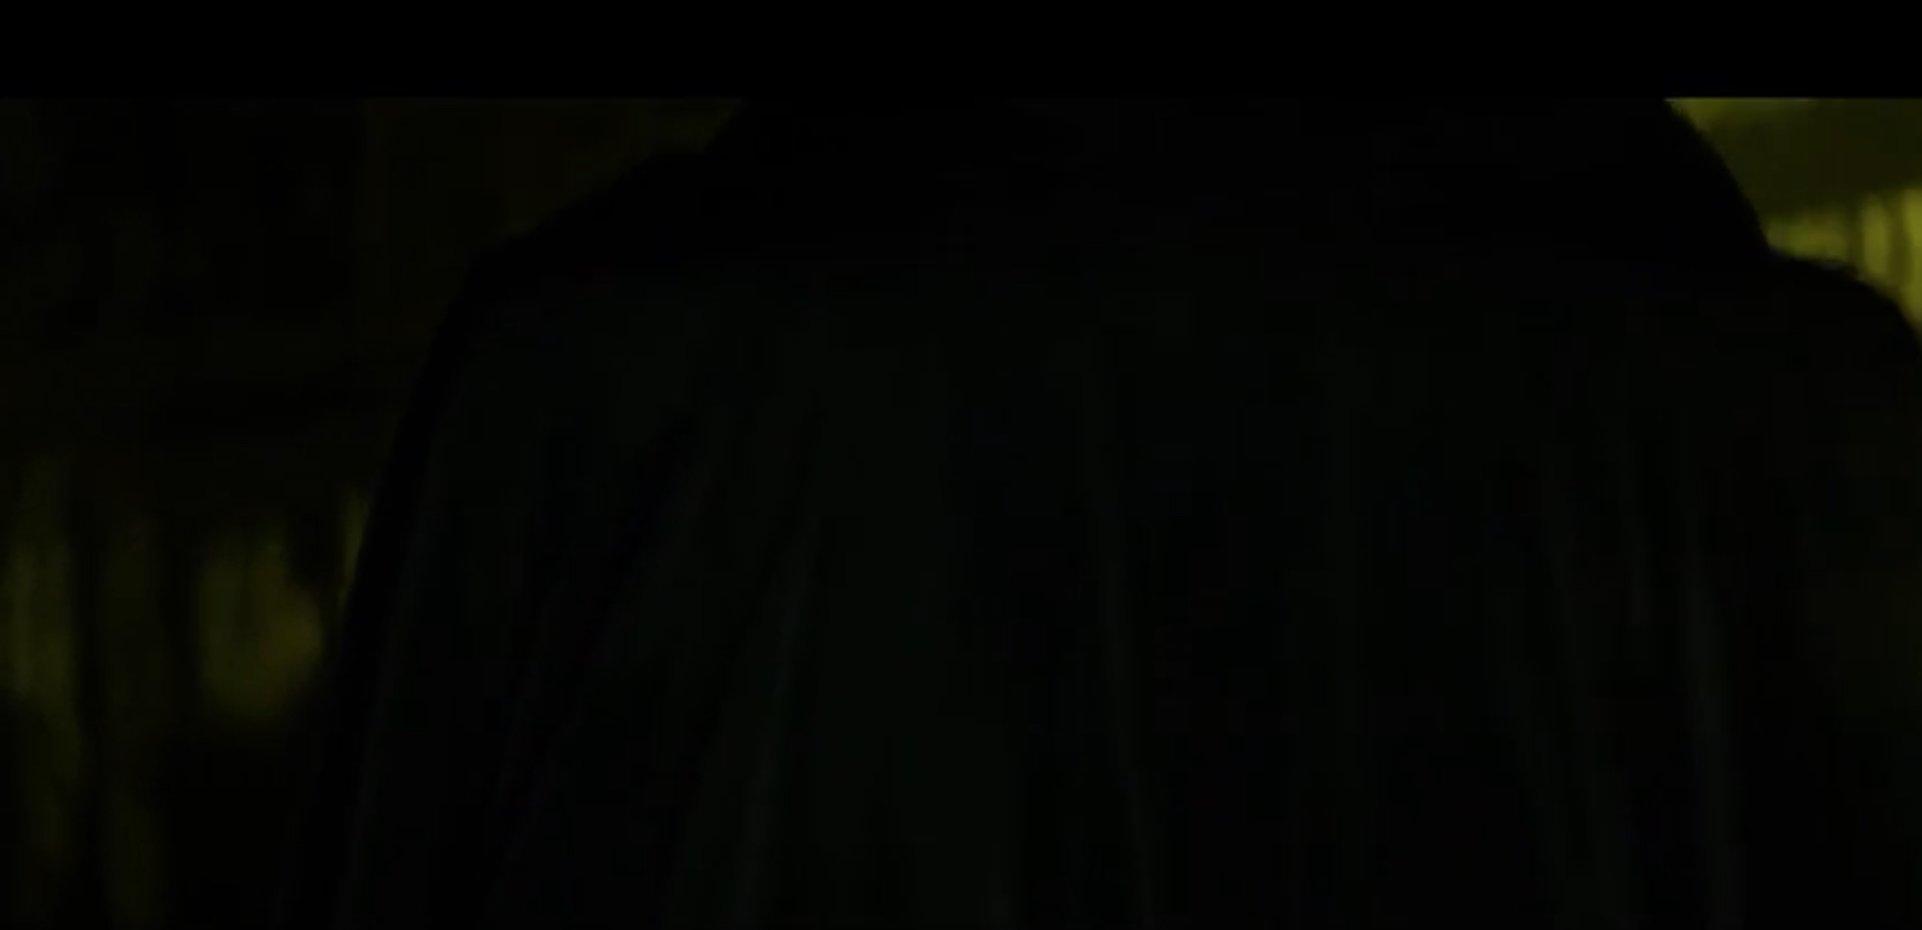 Suspiria Dario Argento cameo